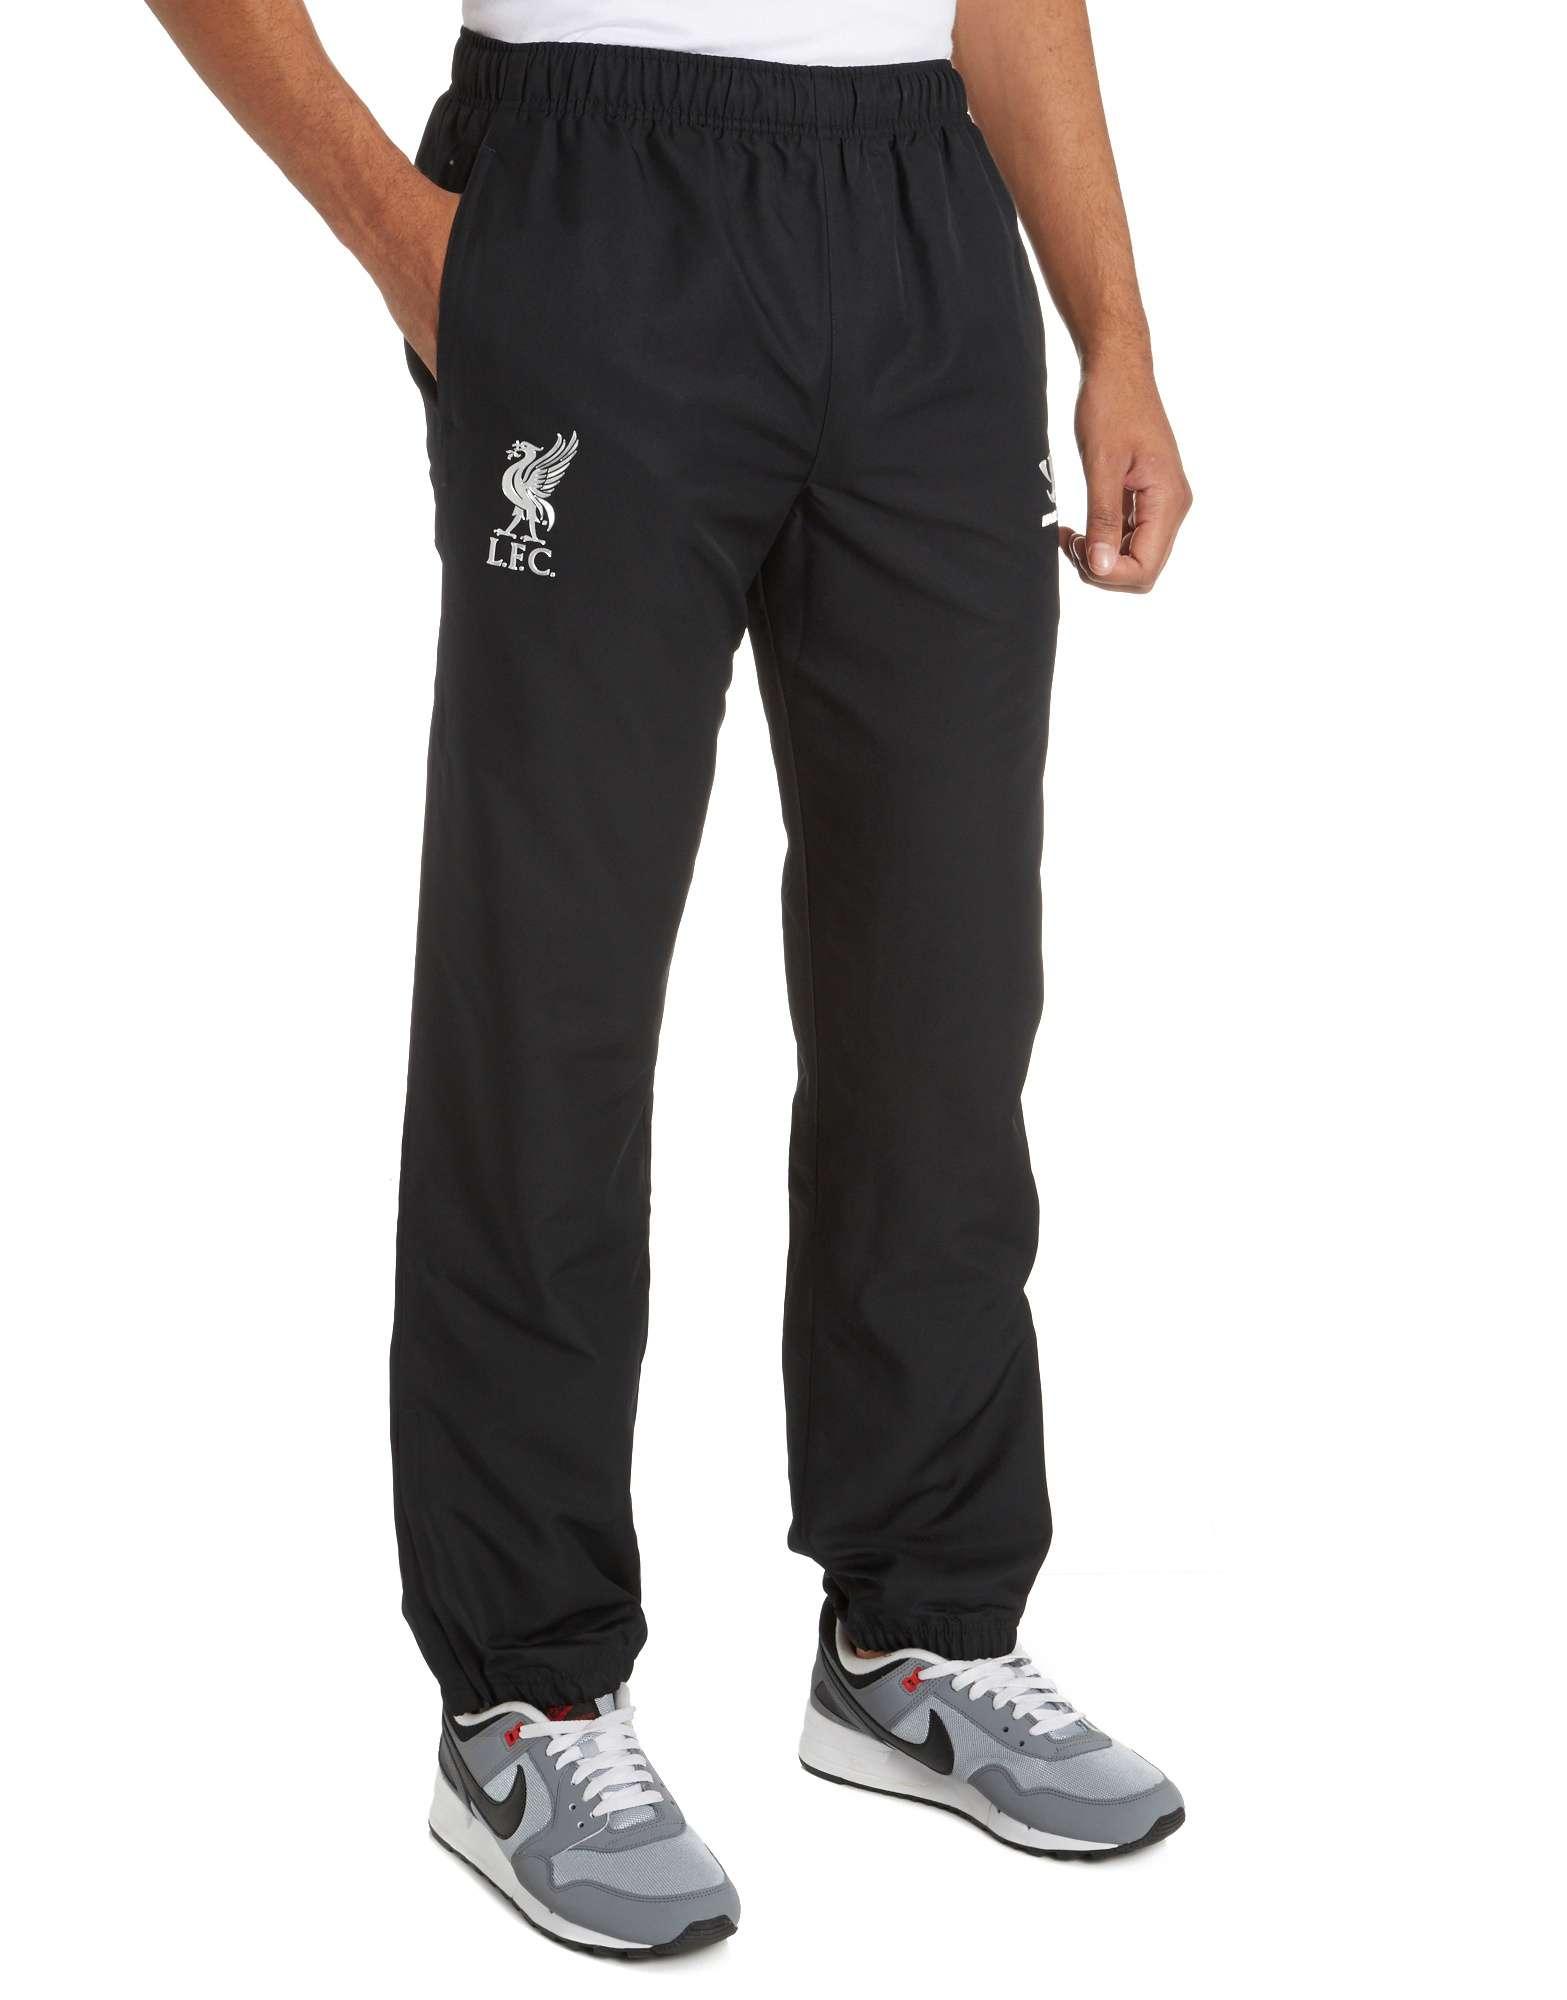 Warrior Sports Liverpool Presentation Track Pants